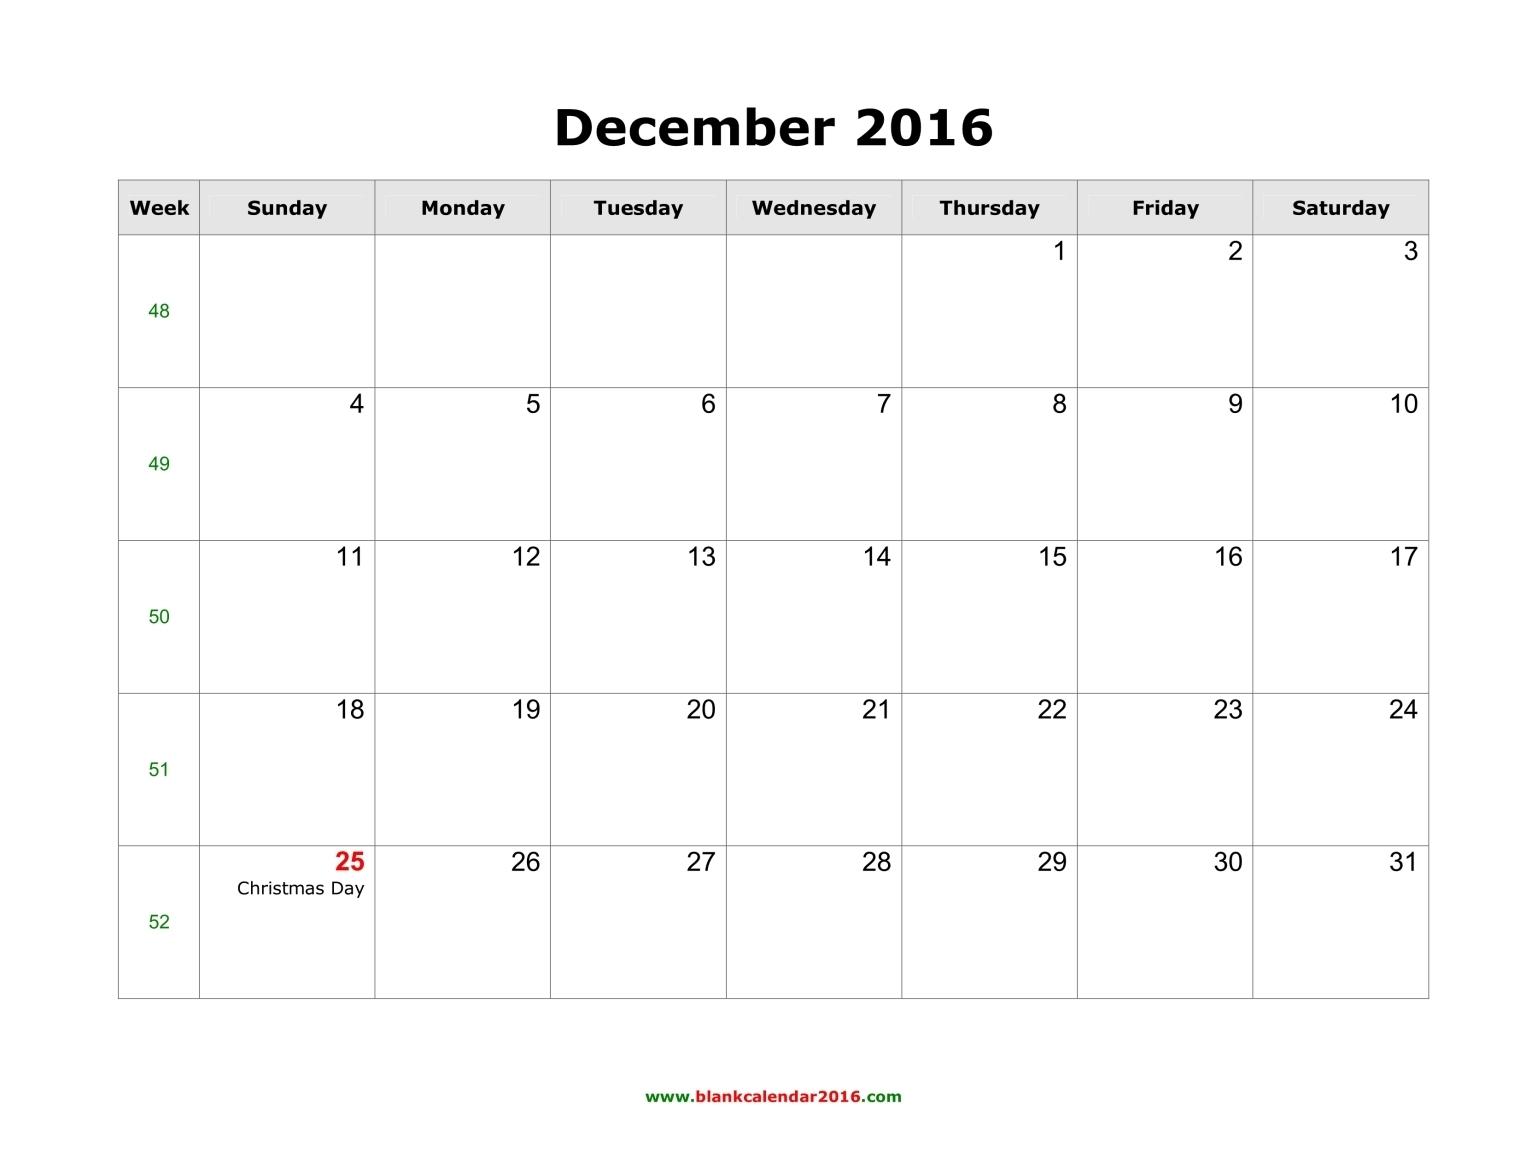 December calendar 2016 image library Blank Calendar for December 2016 image library